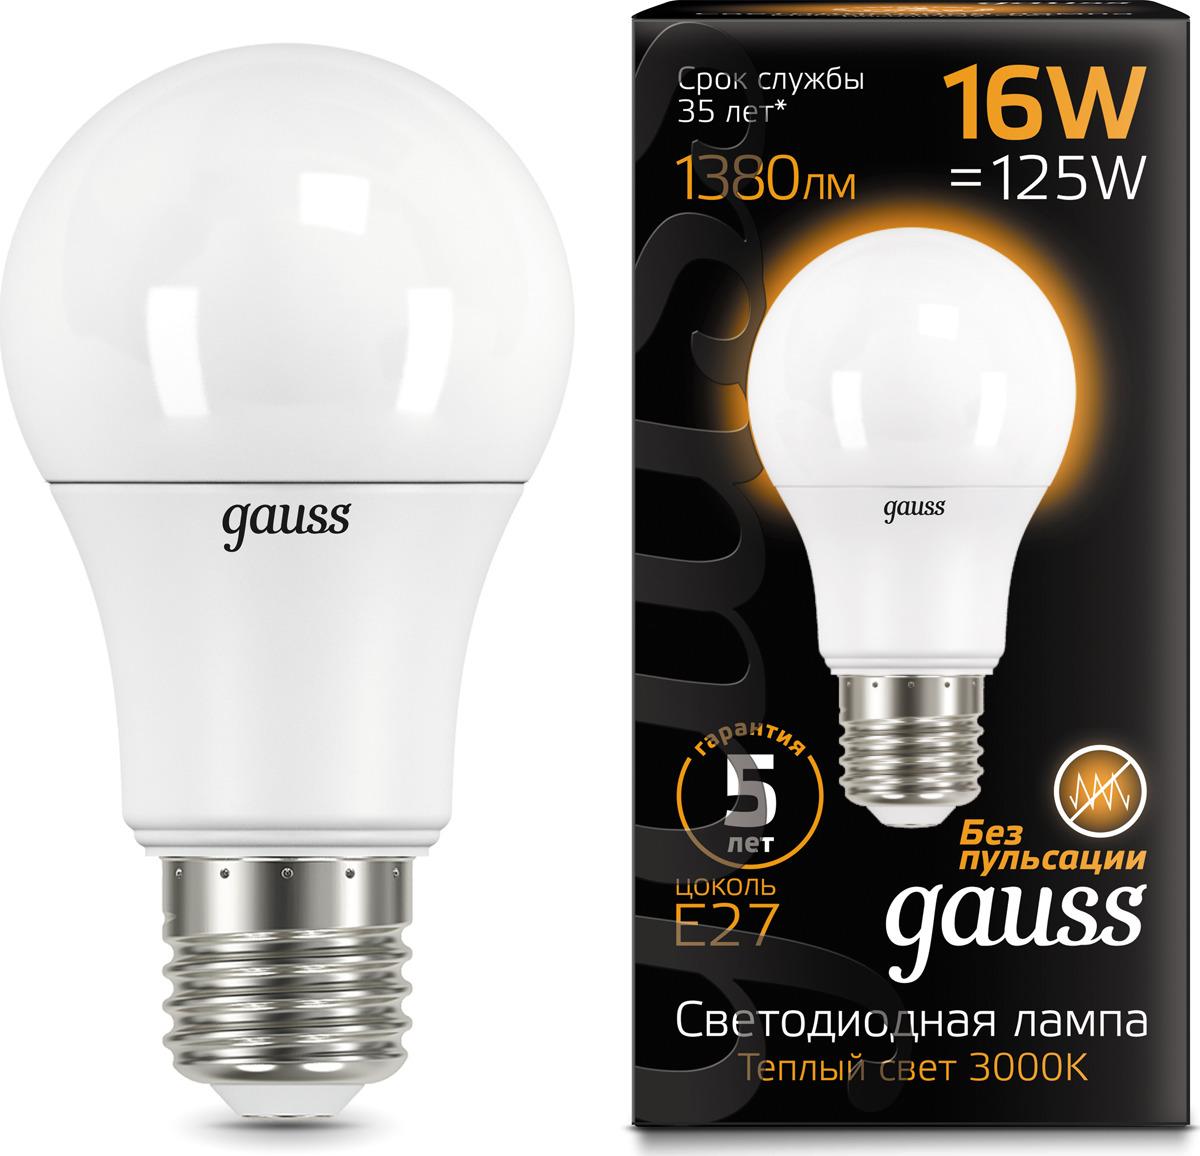 Лампочка Gauss Black LED, A60, E27, 16W. 102502116